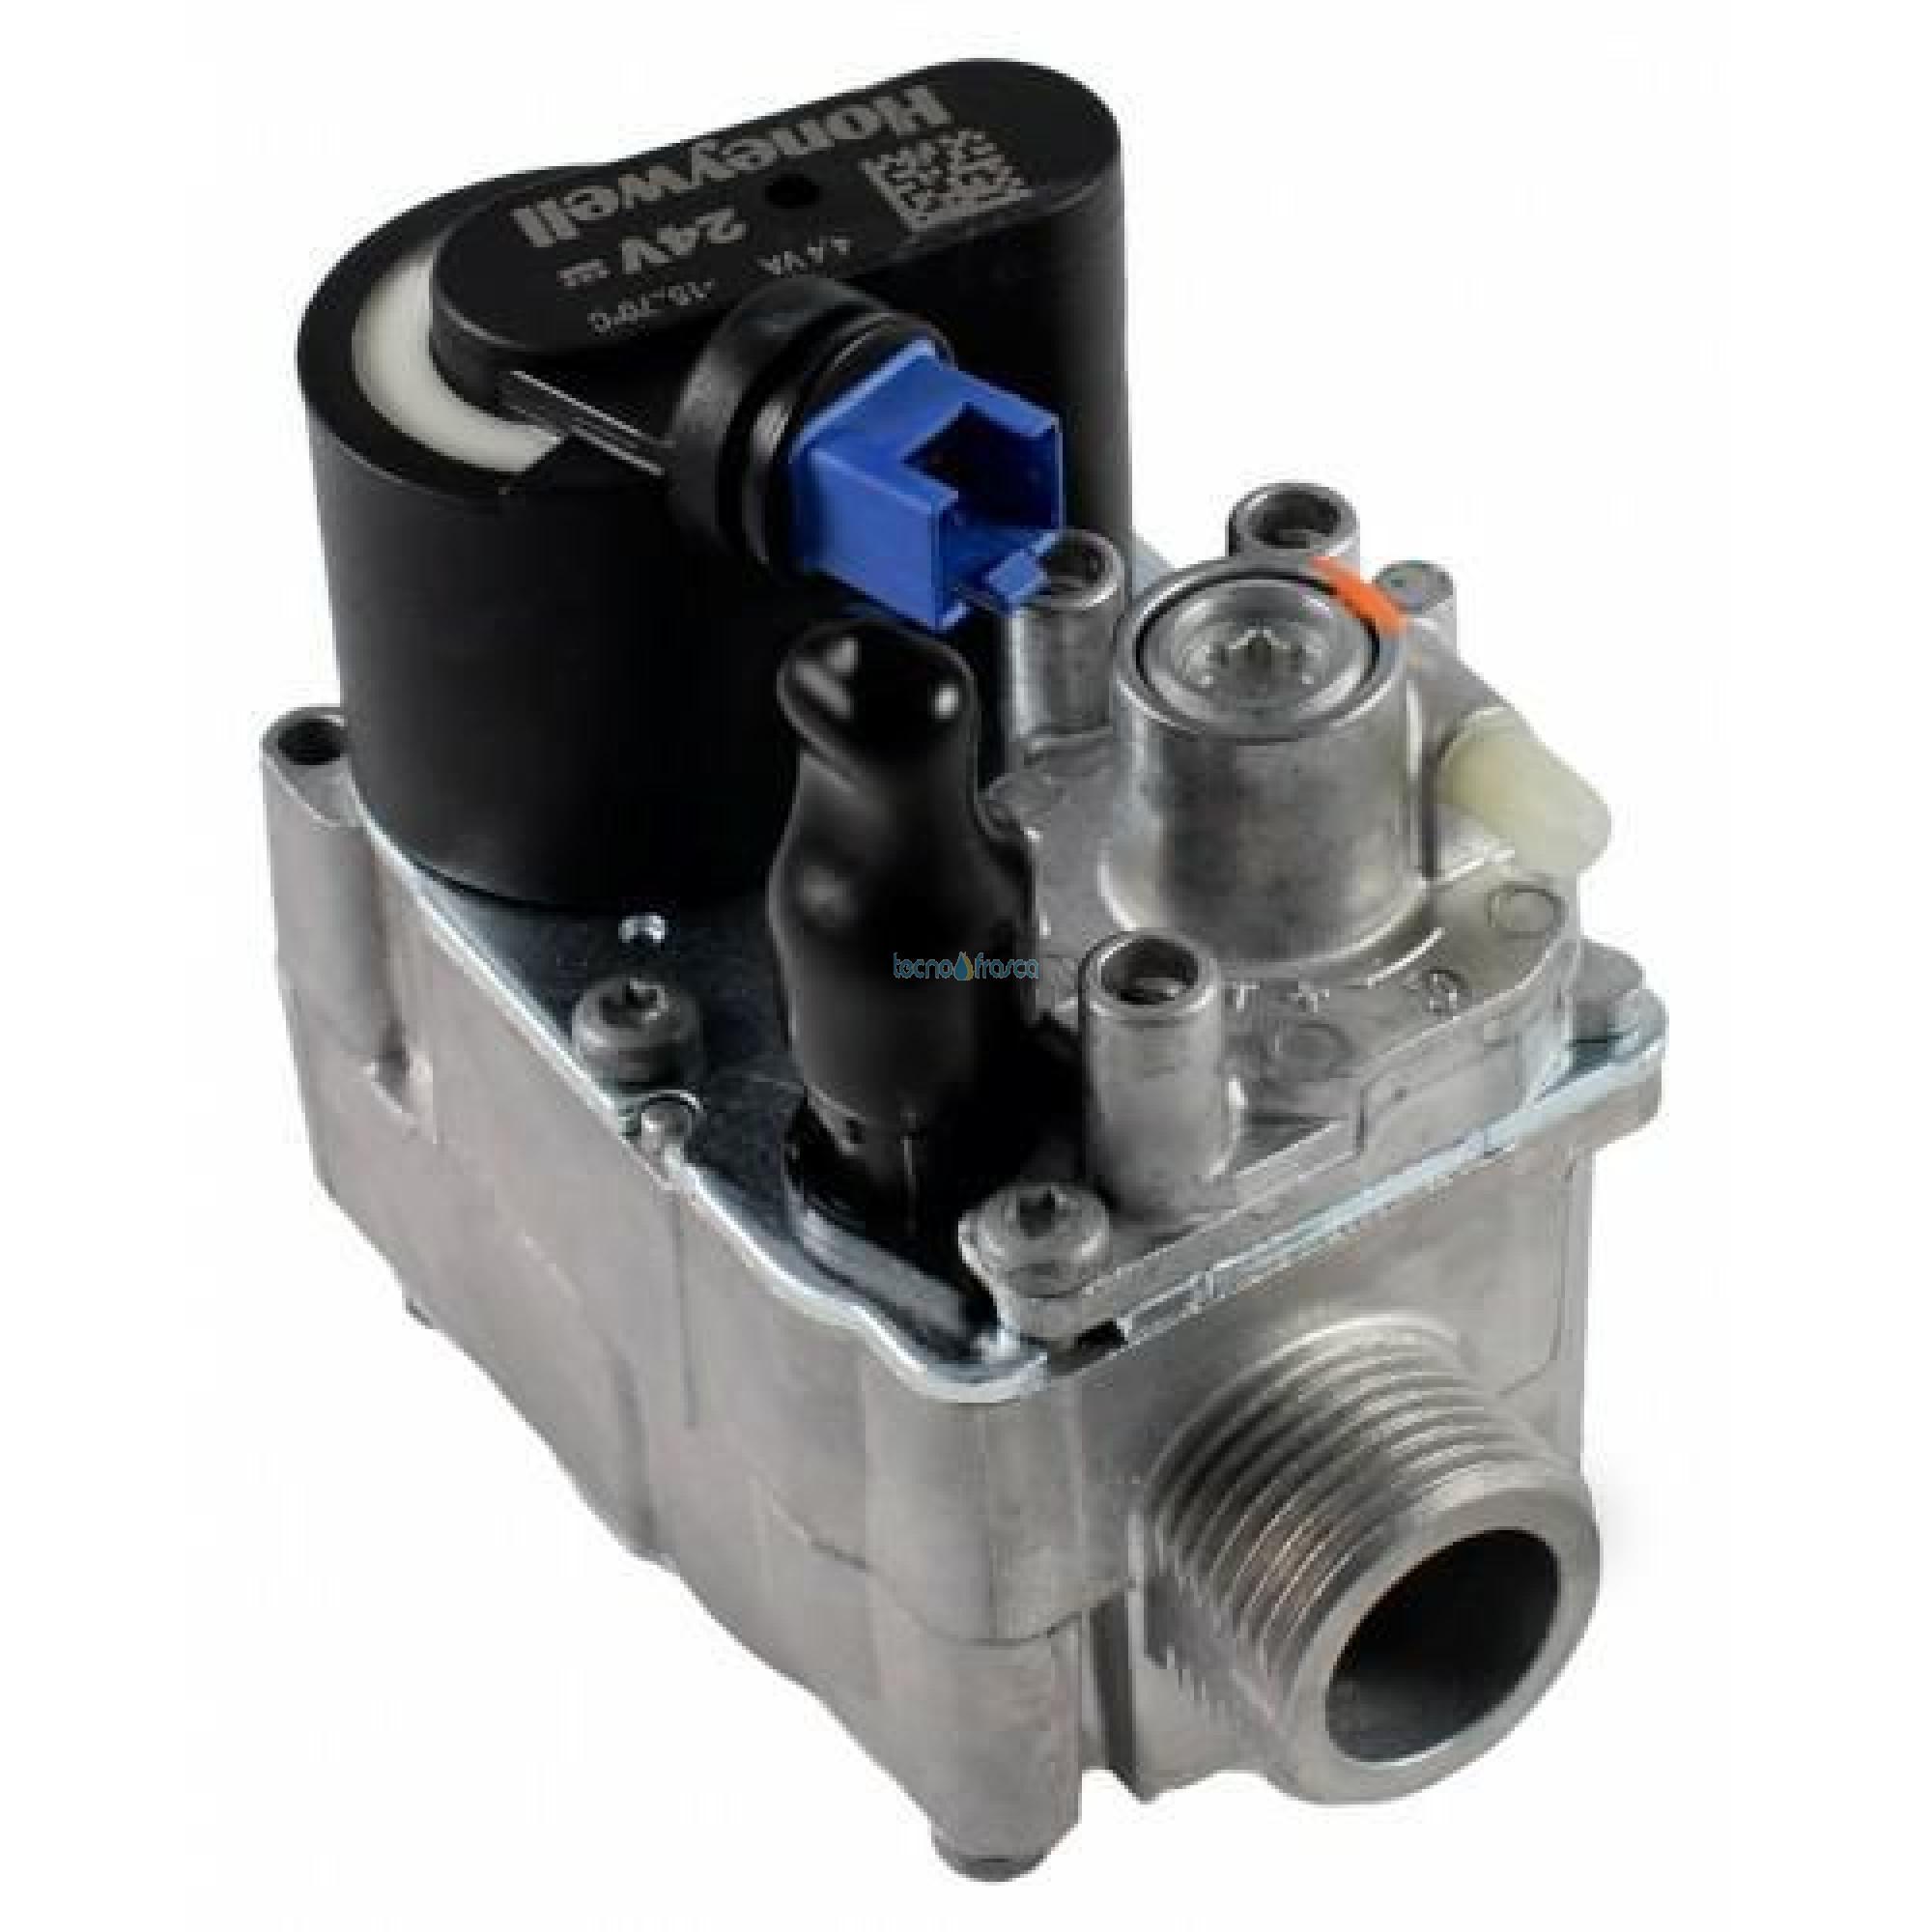 Immergas valvola gas px2 vk8205ve1011 24 vdc rac 1.039944